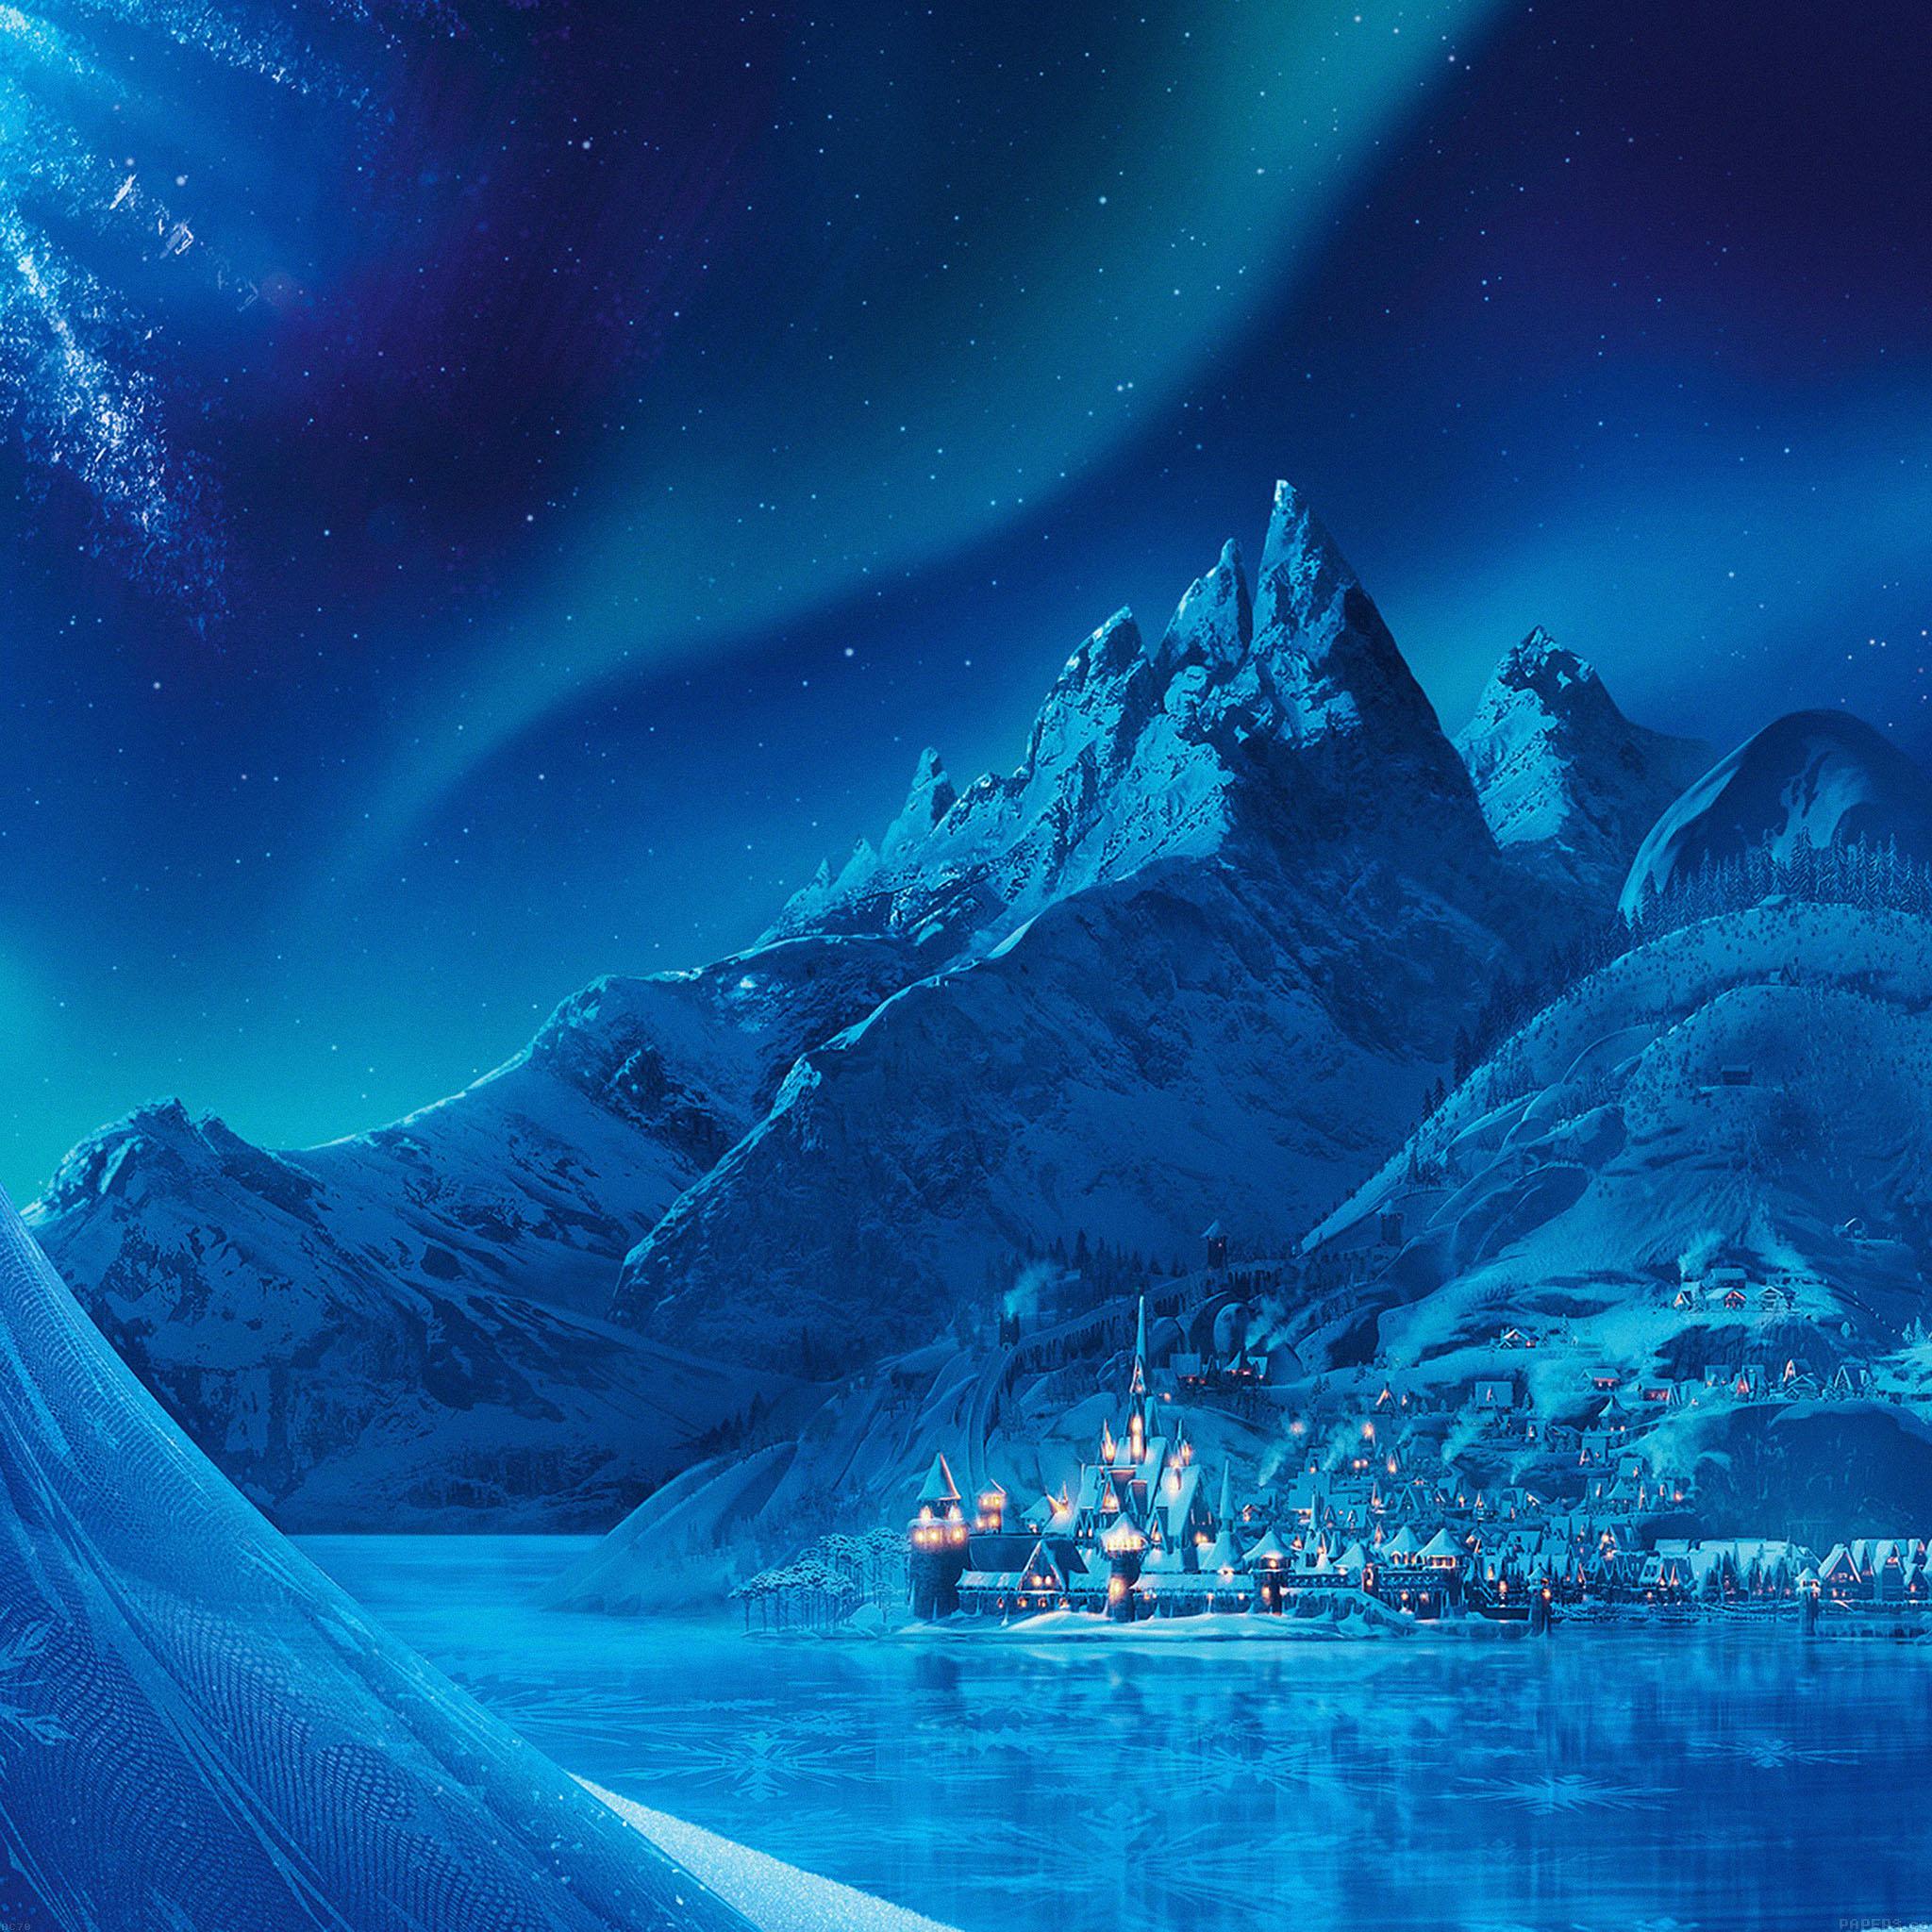 ac70-wallpaper-elsa-frozen-castle-queen-disney-illust-snow ...